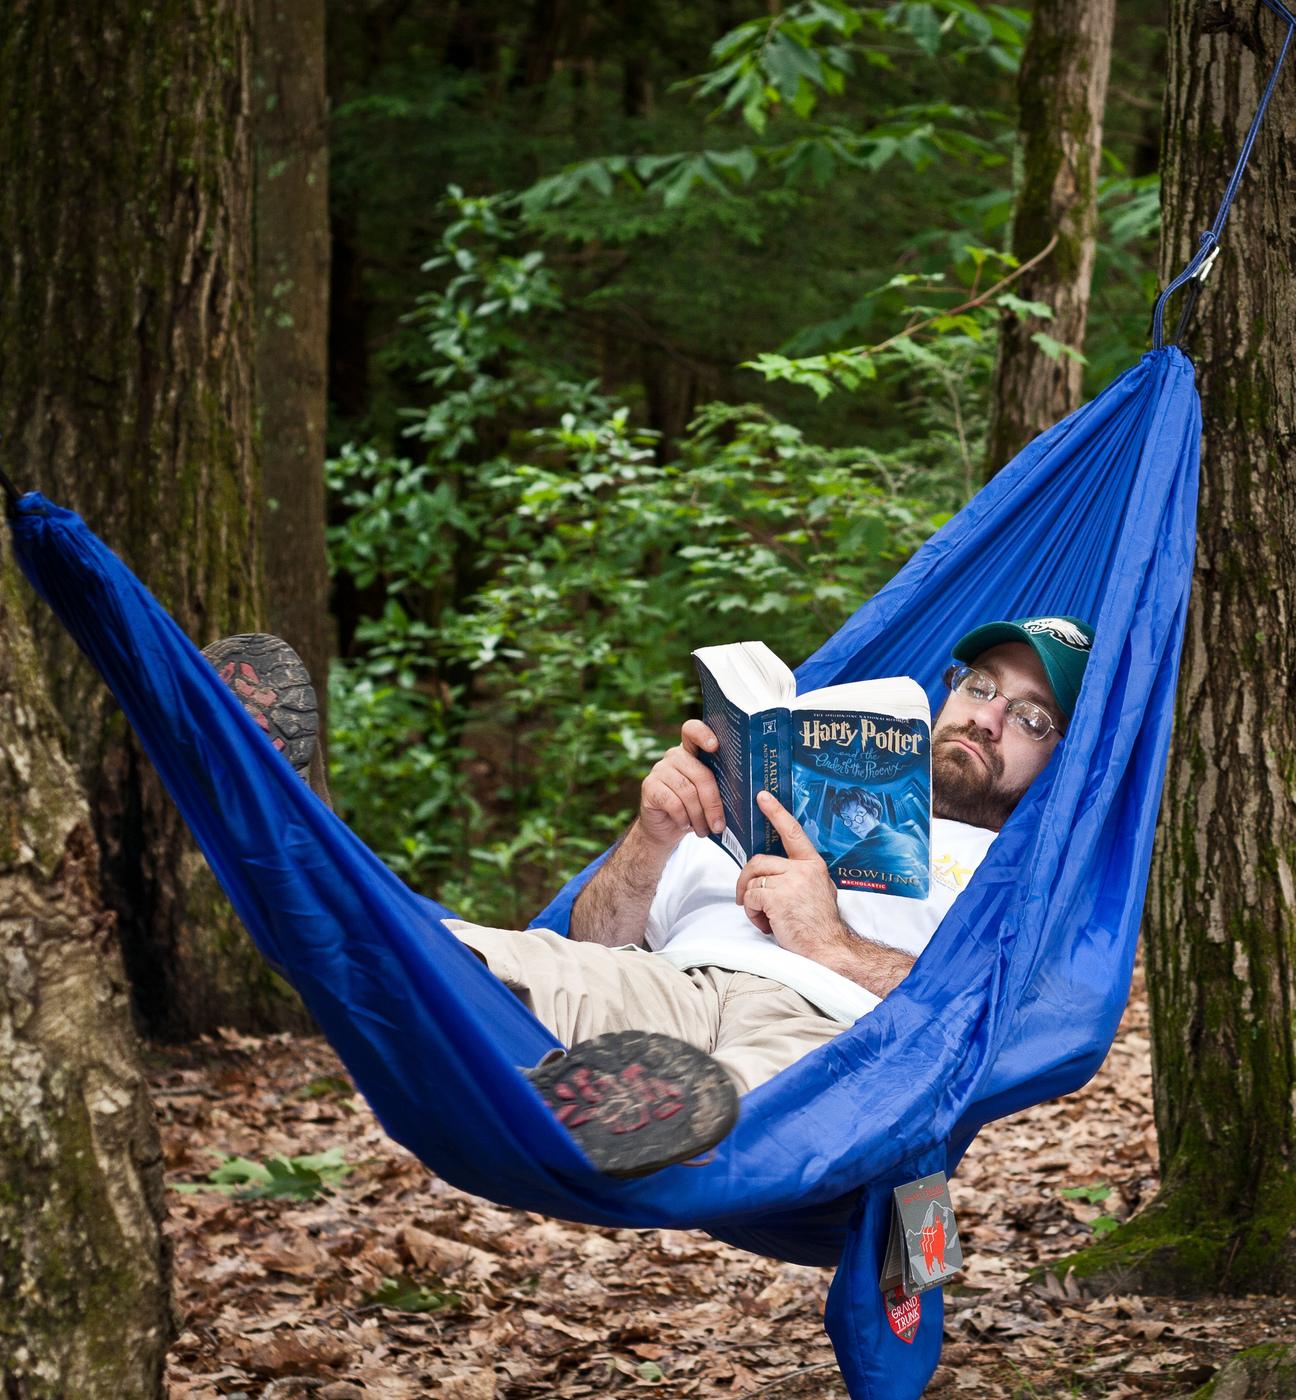 Best Camping Hammock Under 100